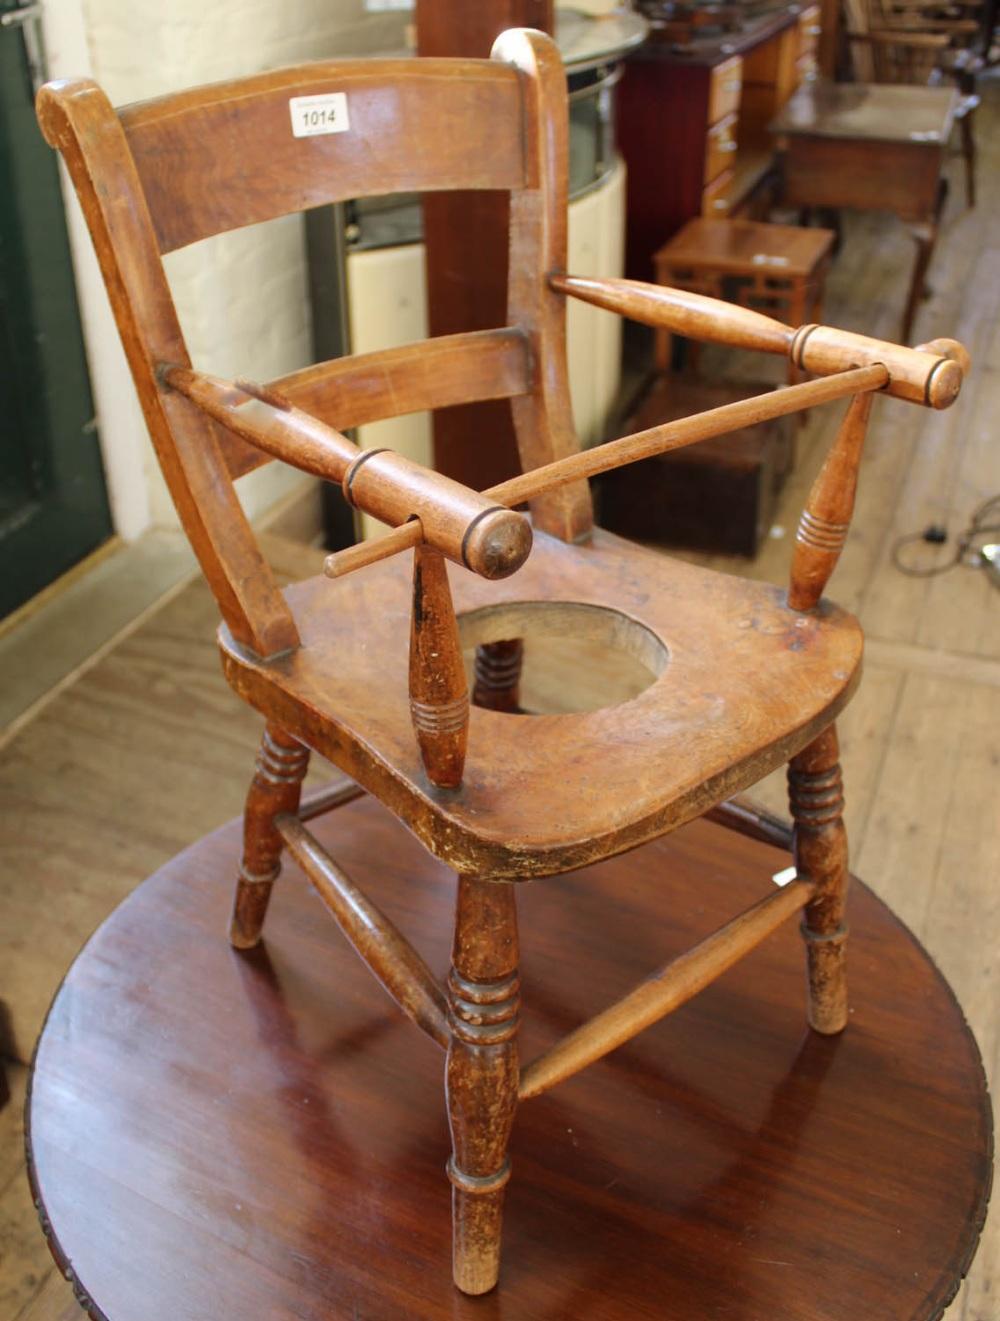 Lot 1014 - An Edwardian elm child's chair